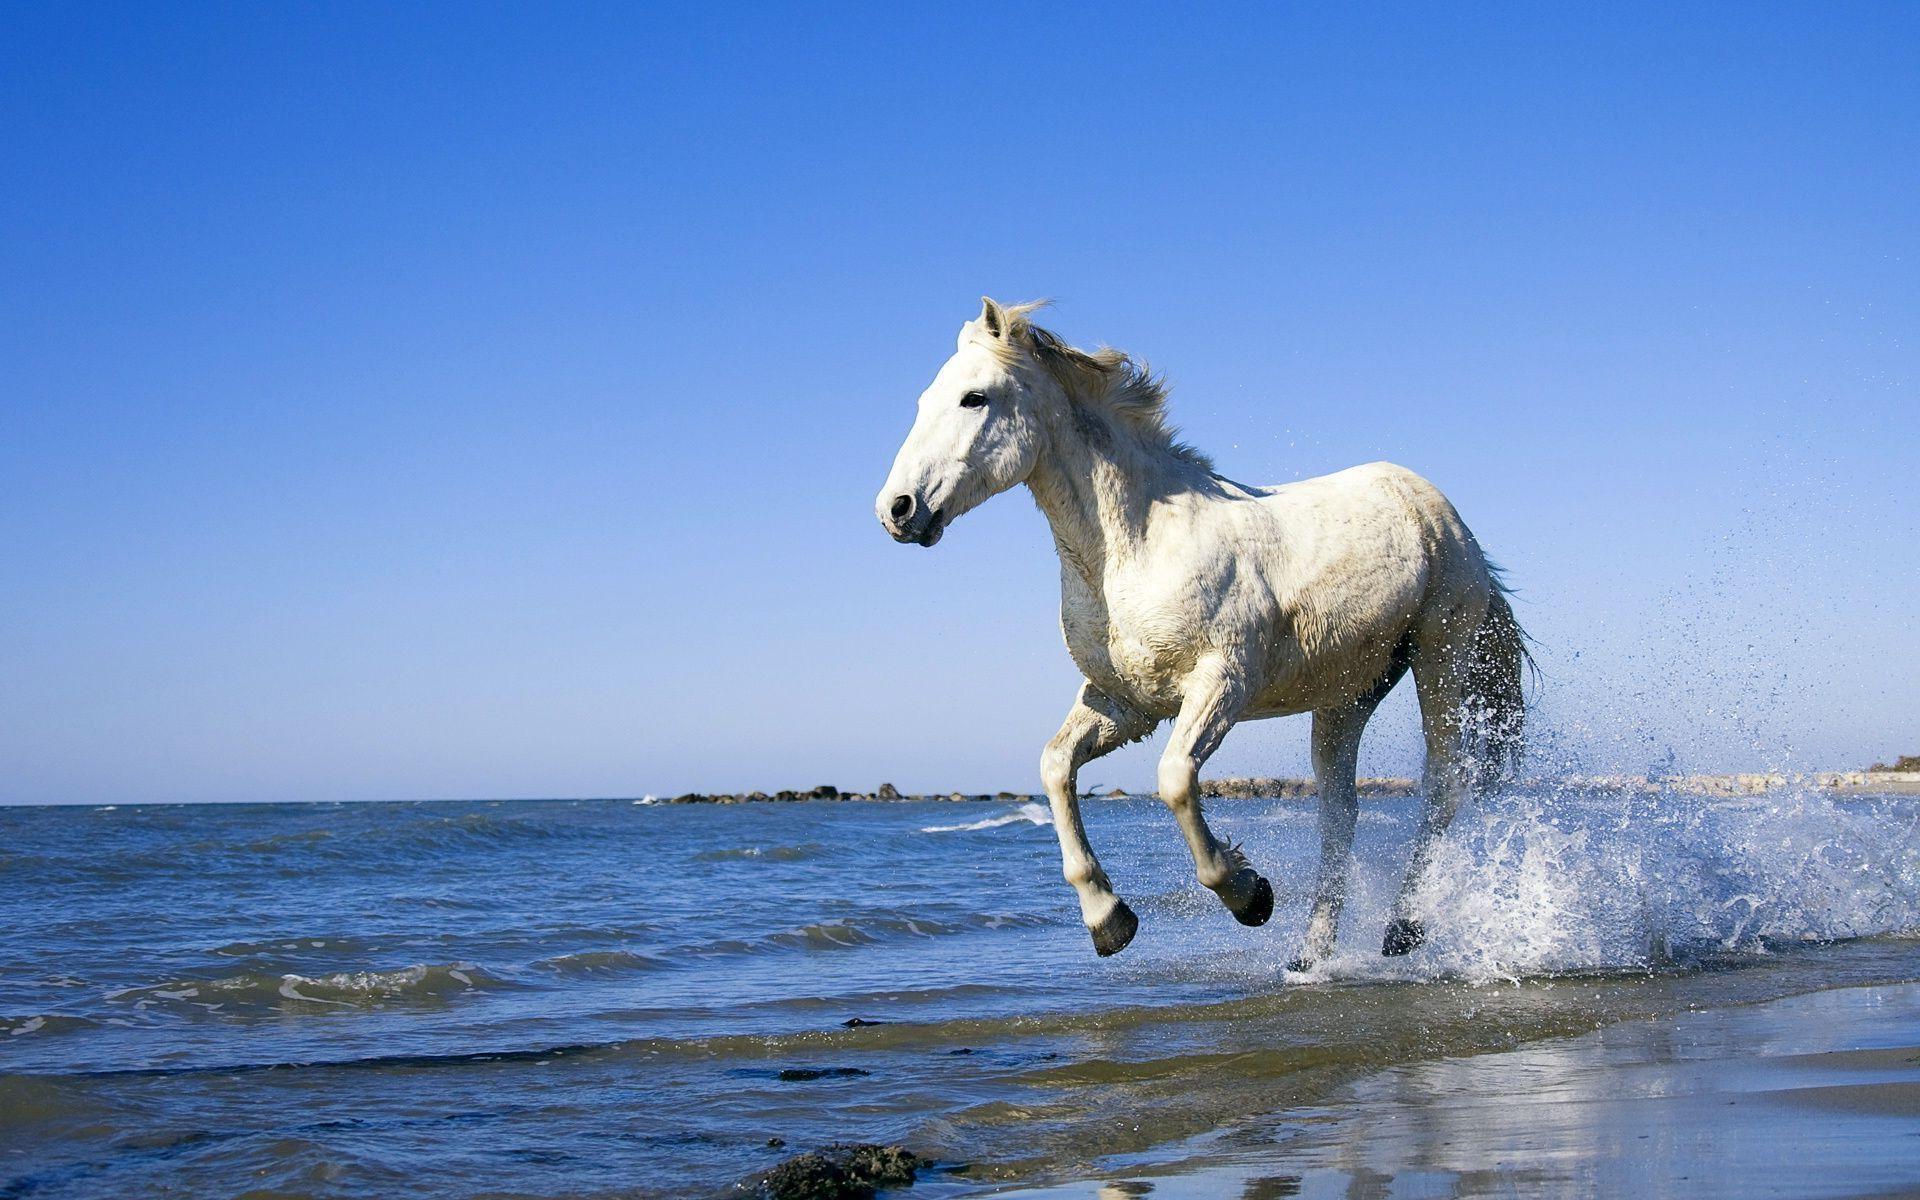 White horse on the beach wallpaper | Animals | Pinterest ... - photo#26